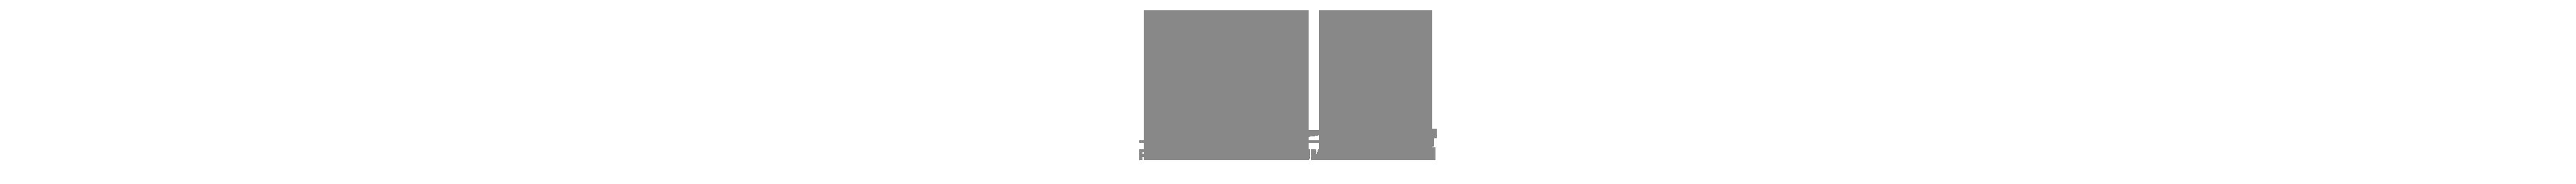 RIVERA_ART_MUSEUM